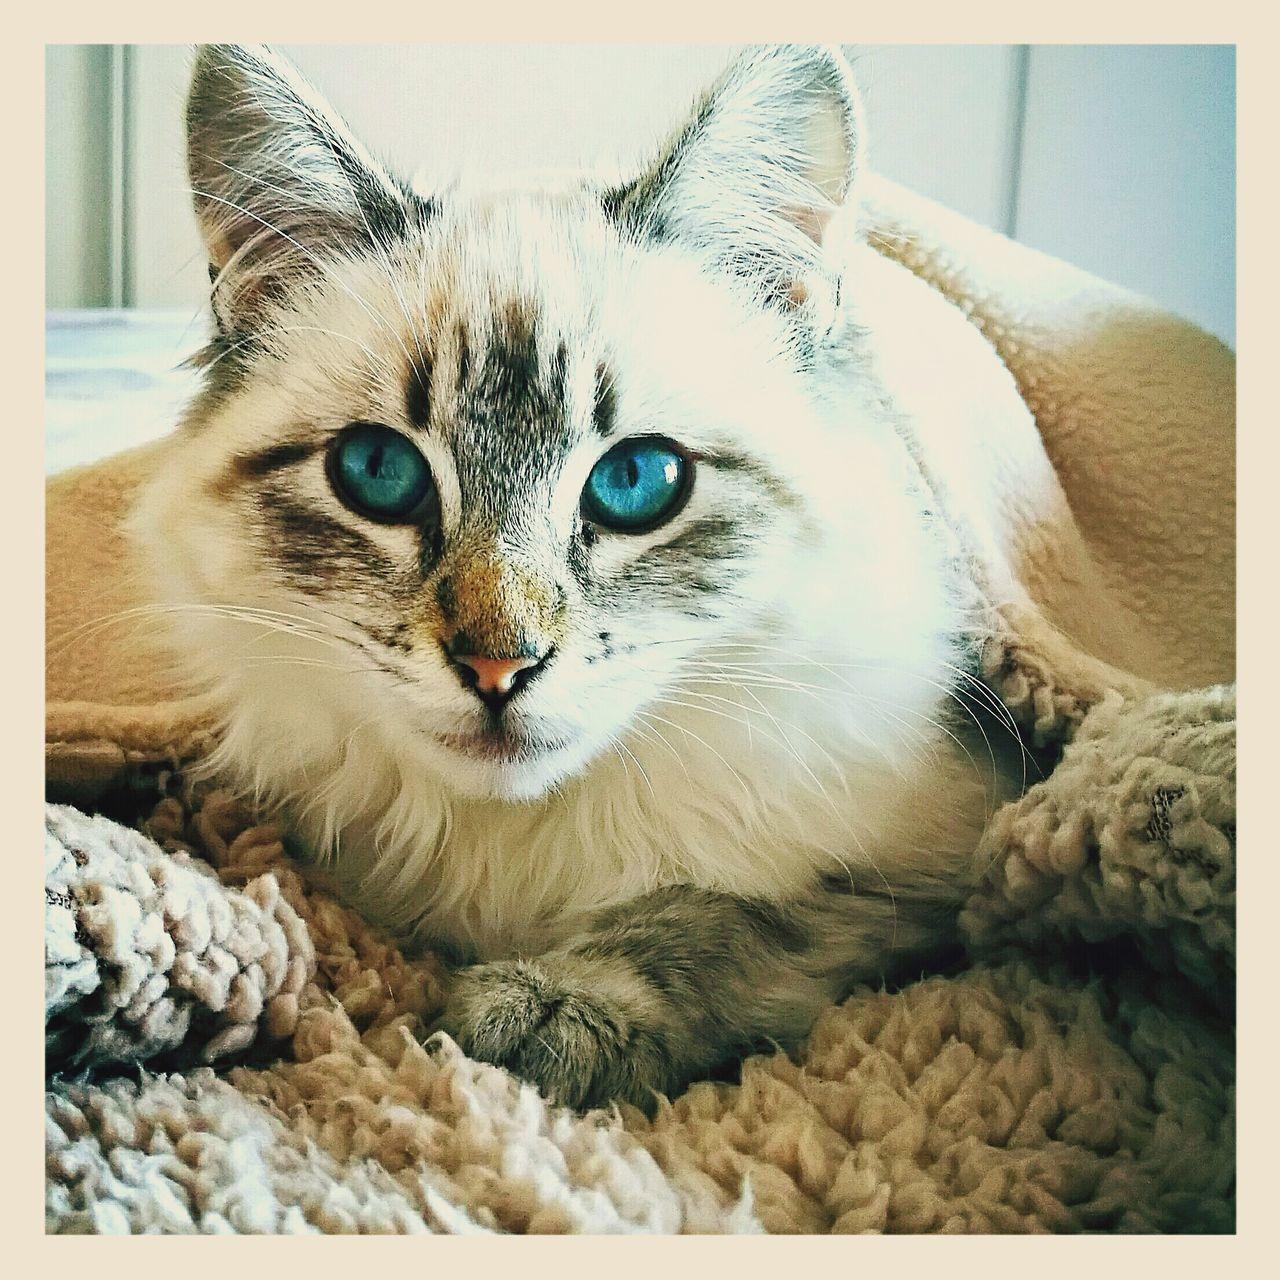 Doris Babycat Mylove Domestic Animals Feline Pets Catwoman Catlovers